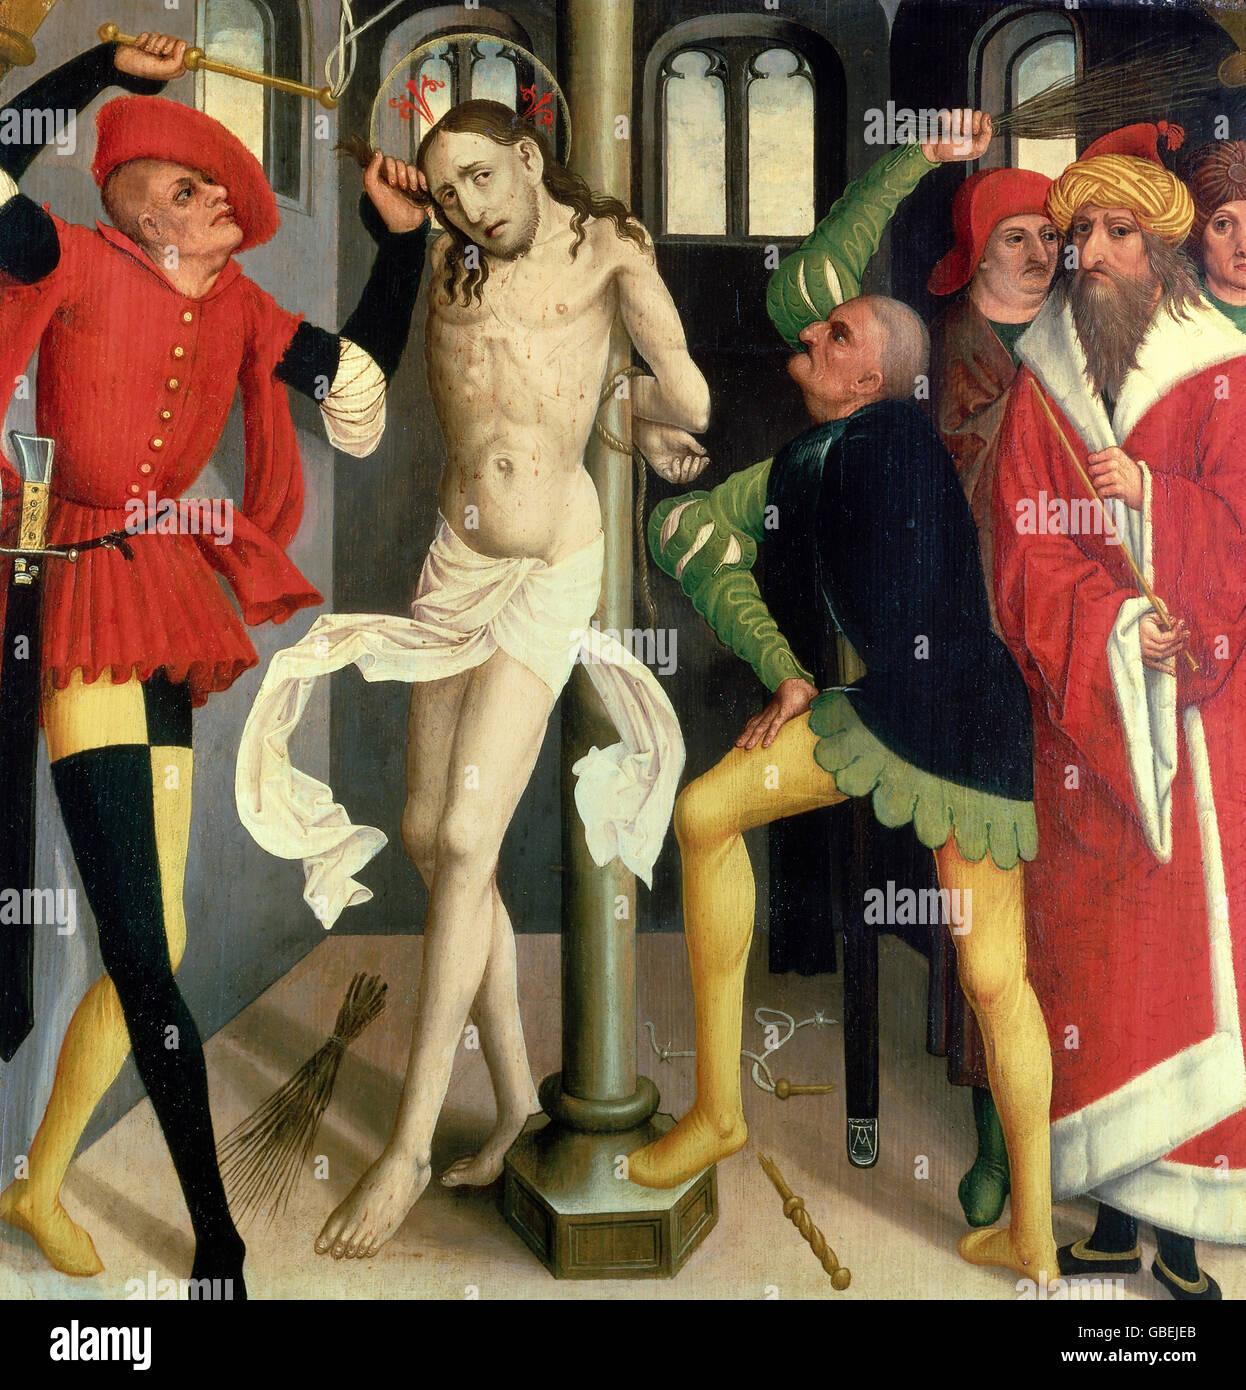 "Bildende Kunst, religiöse Kunst, Jesus Christus, Leidenschaft, Malerei ""Die Geißelung Christi"", Stockbild"